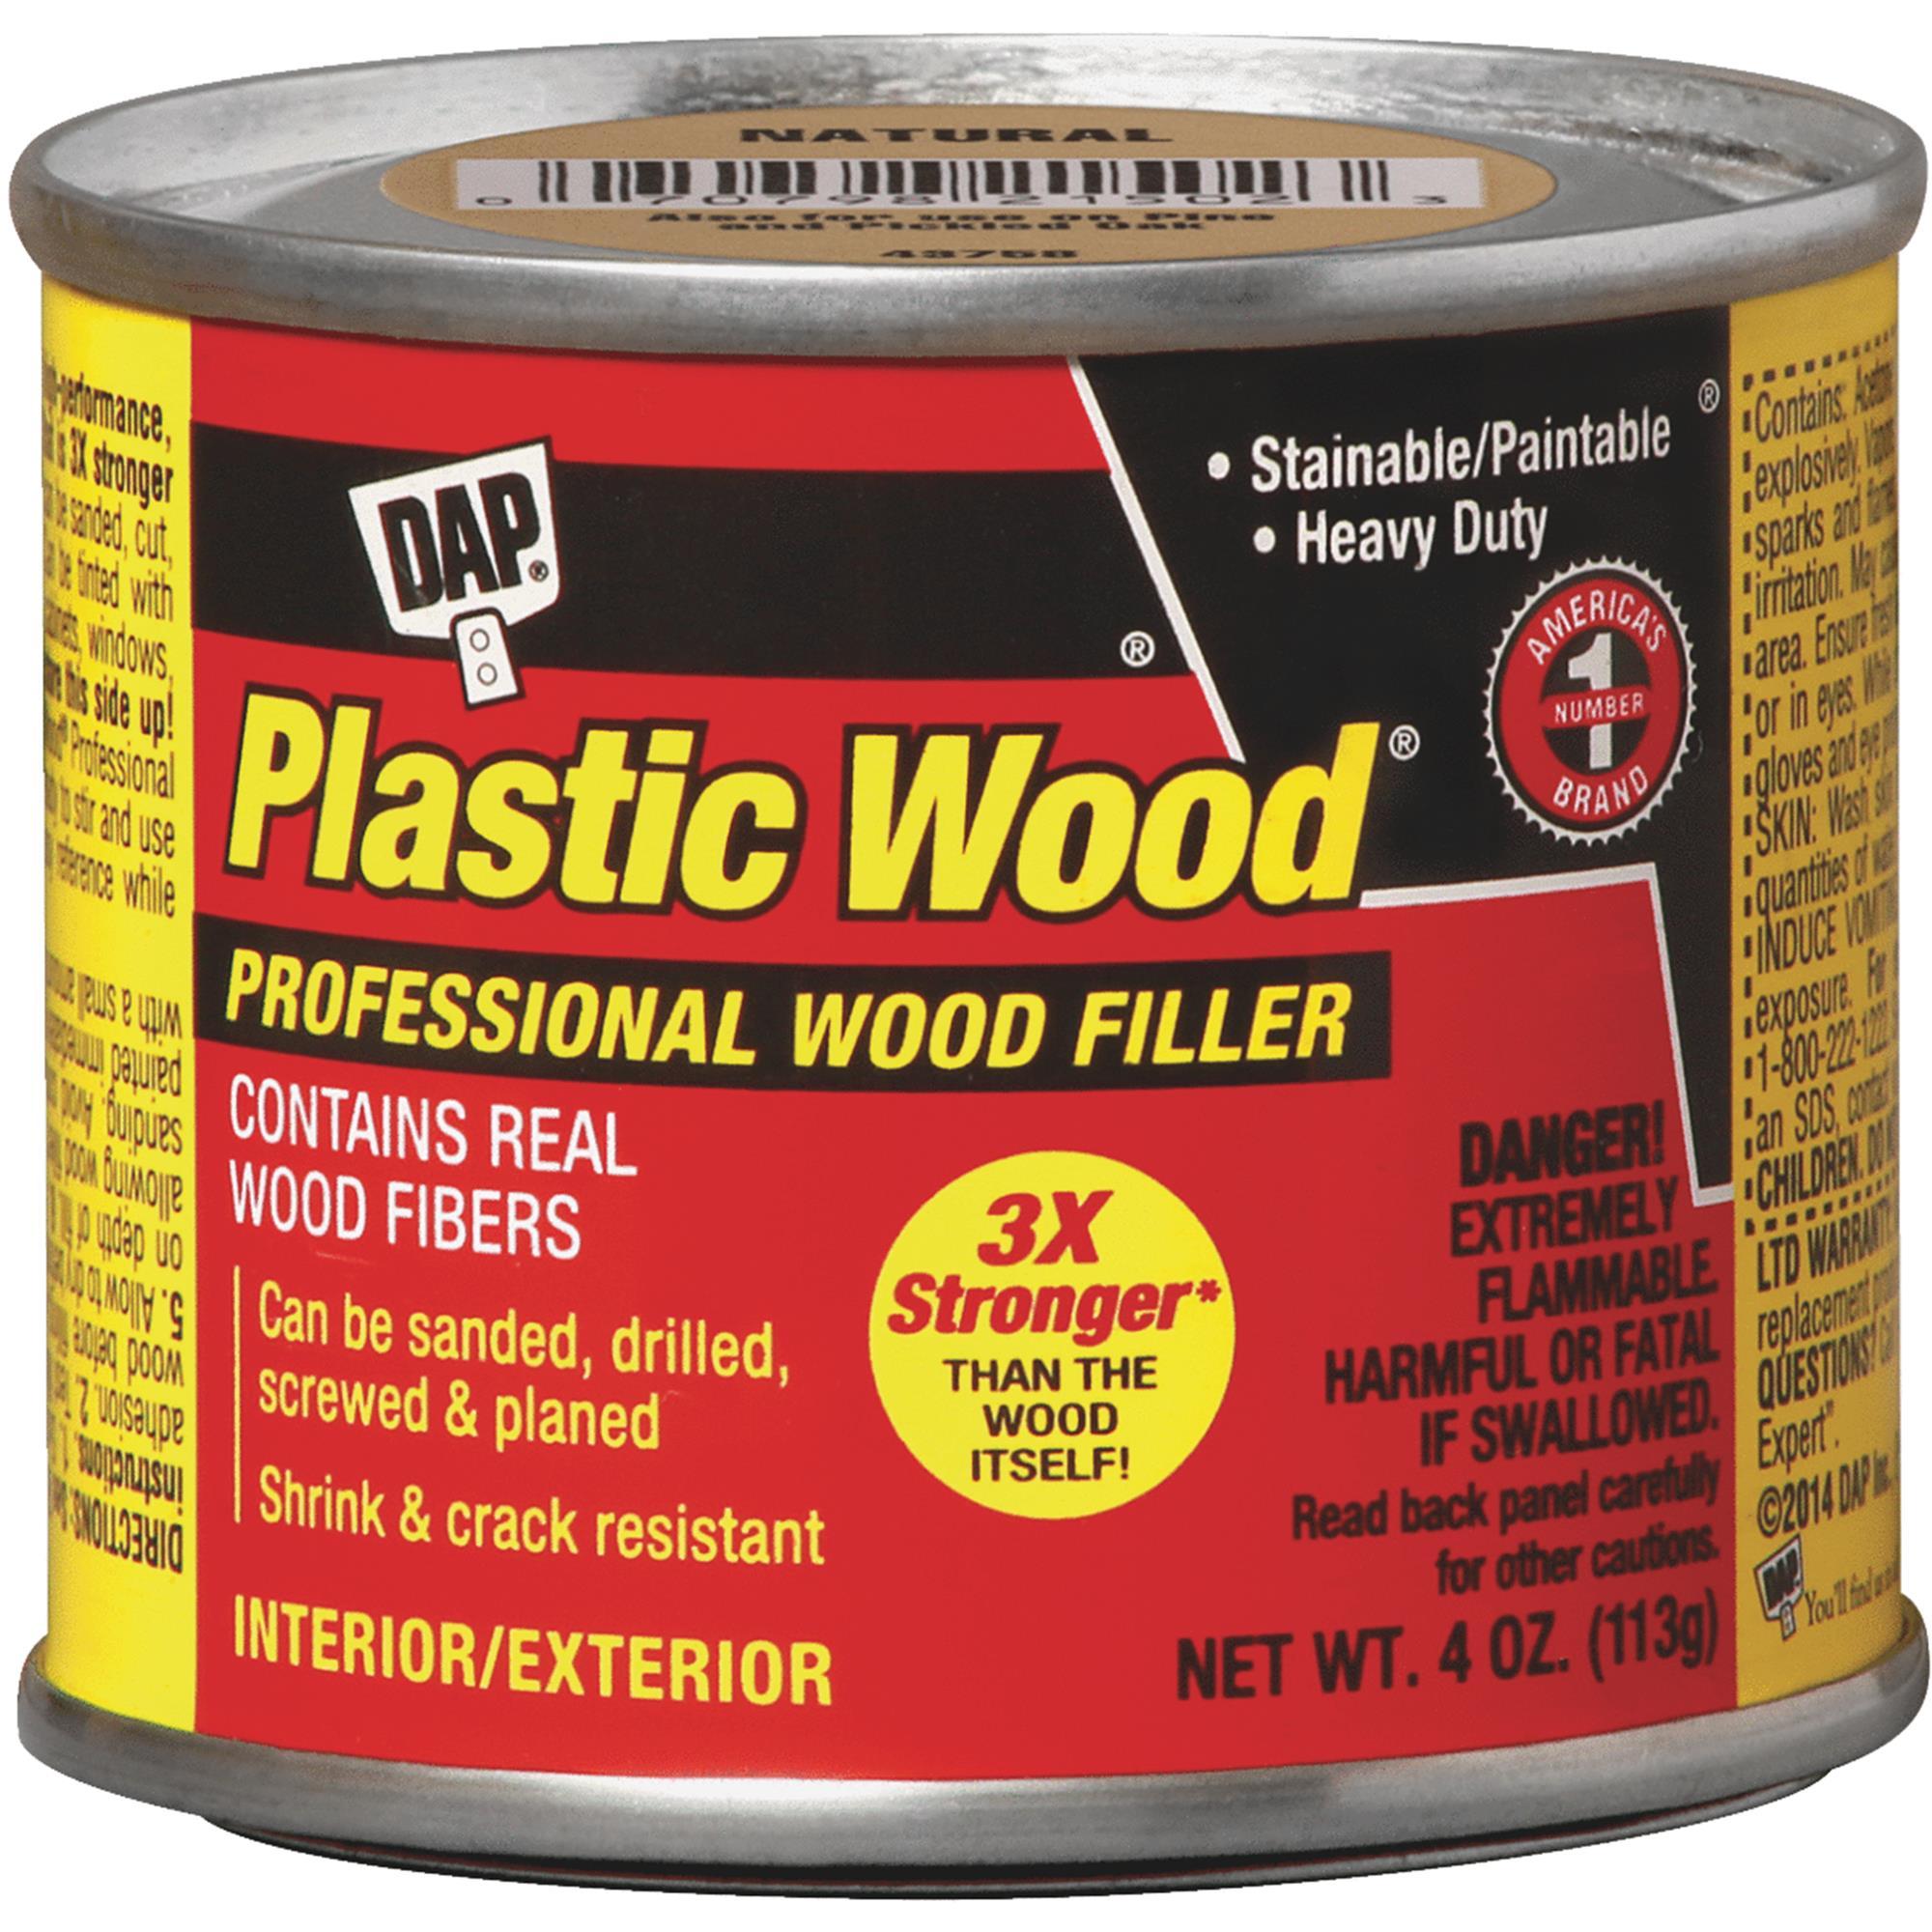 Dap 21434 4 oz. Solvent Wood Filler, Walnut